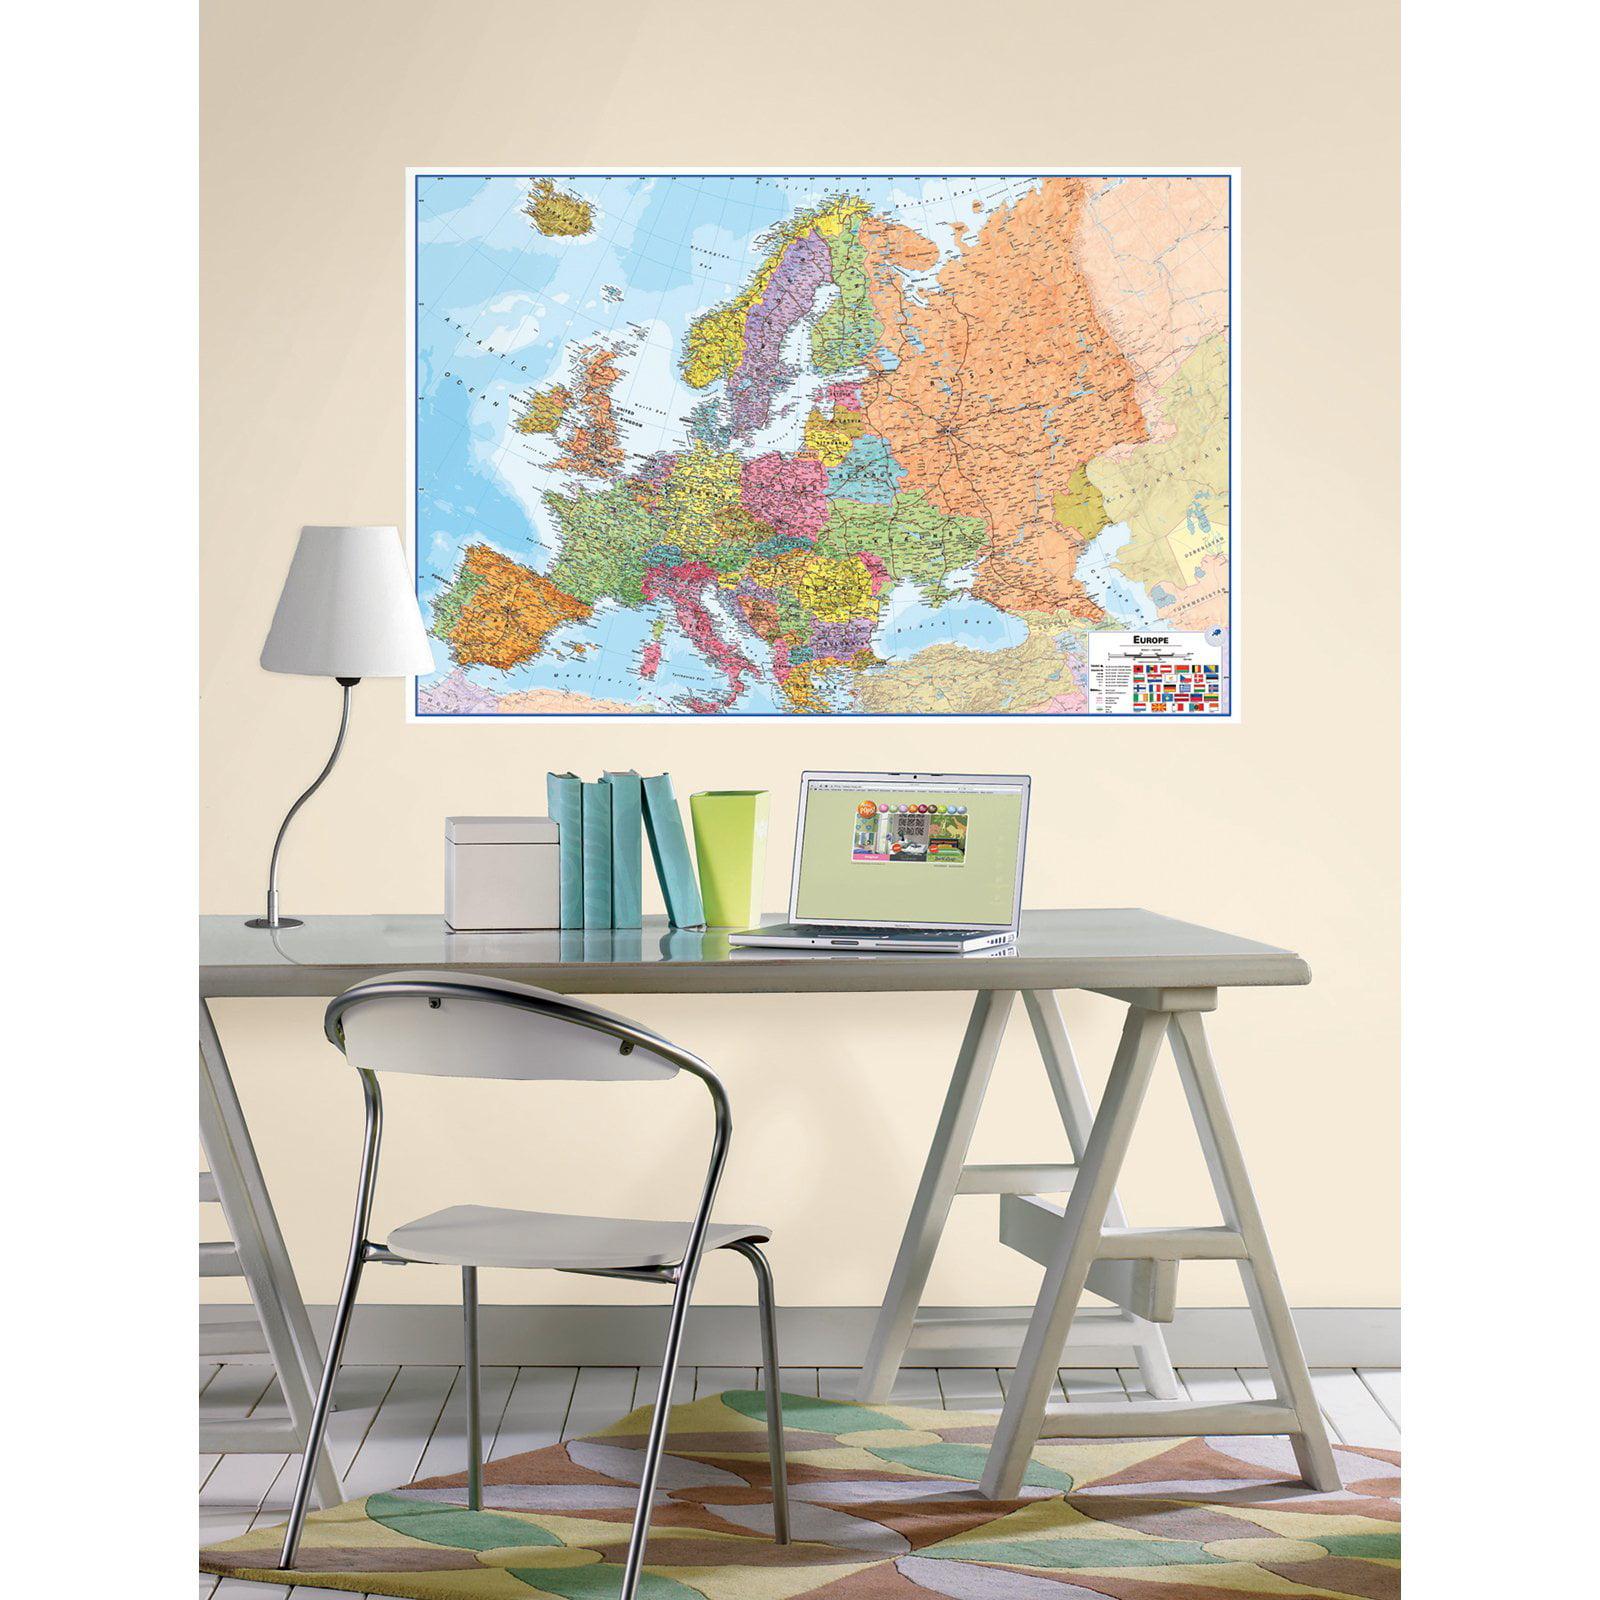 WallPops Europe Dry Erase Map Decal